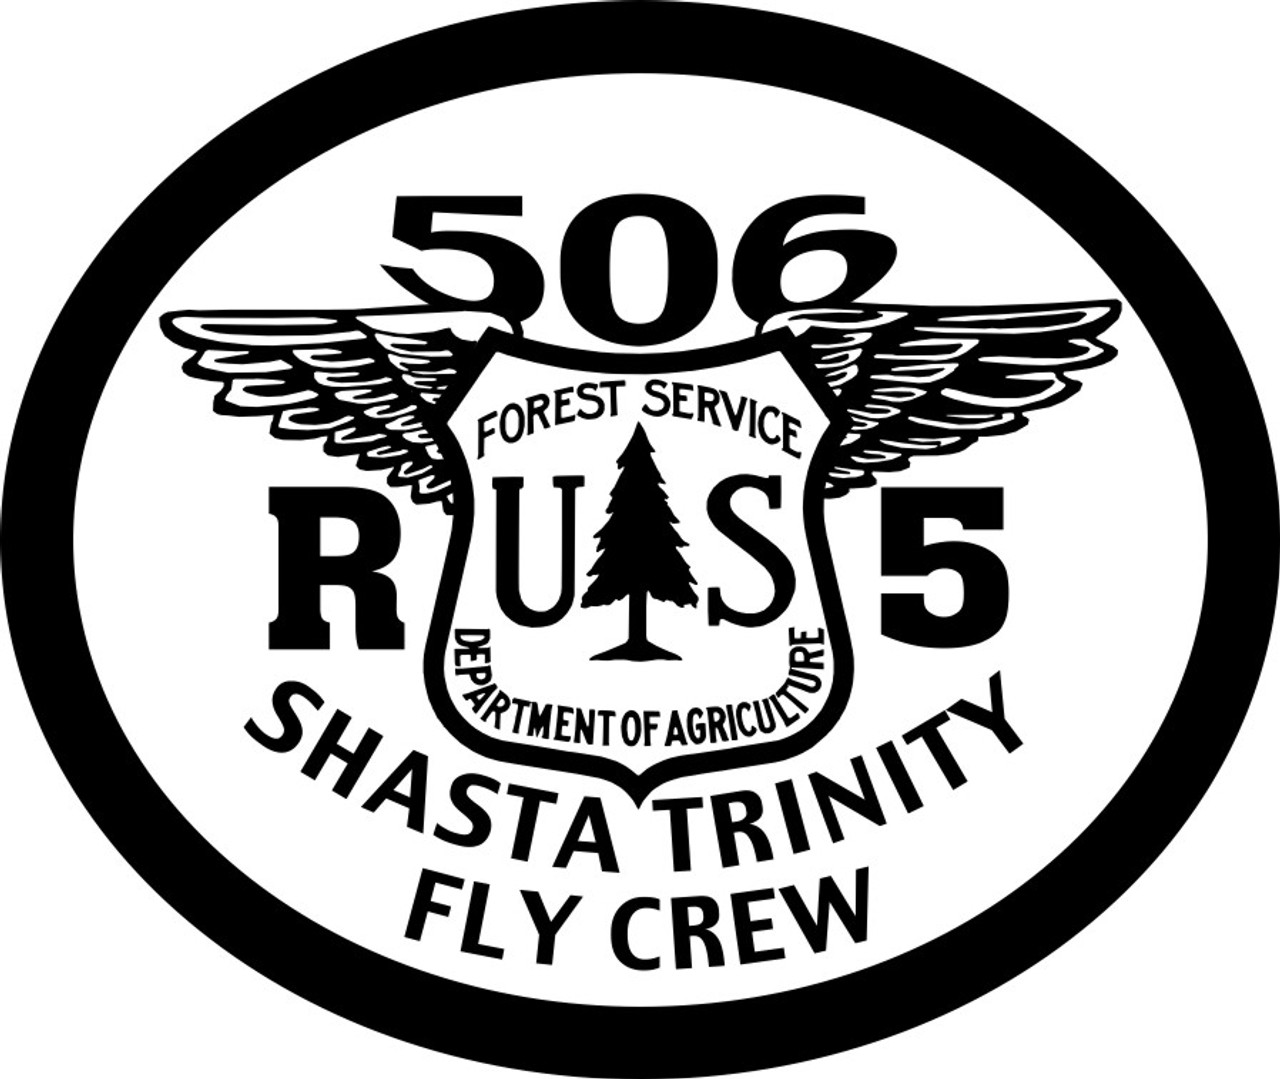 Shasta Trinity Fly Crew 506 R-5 Buckle (RESTRICTED)